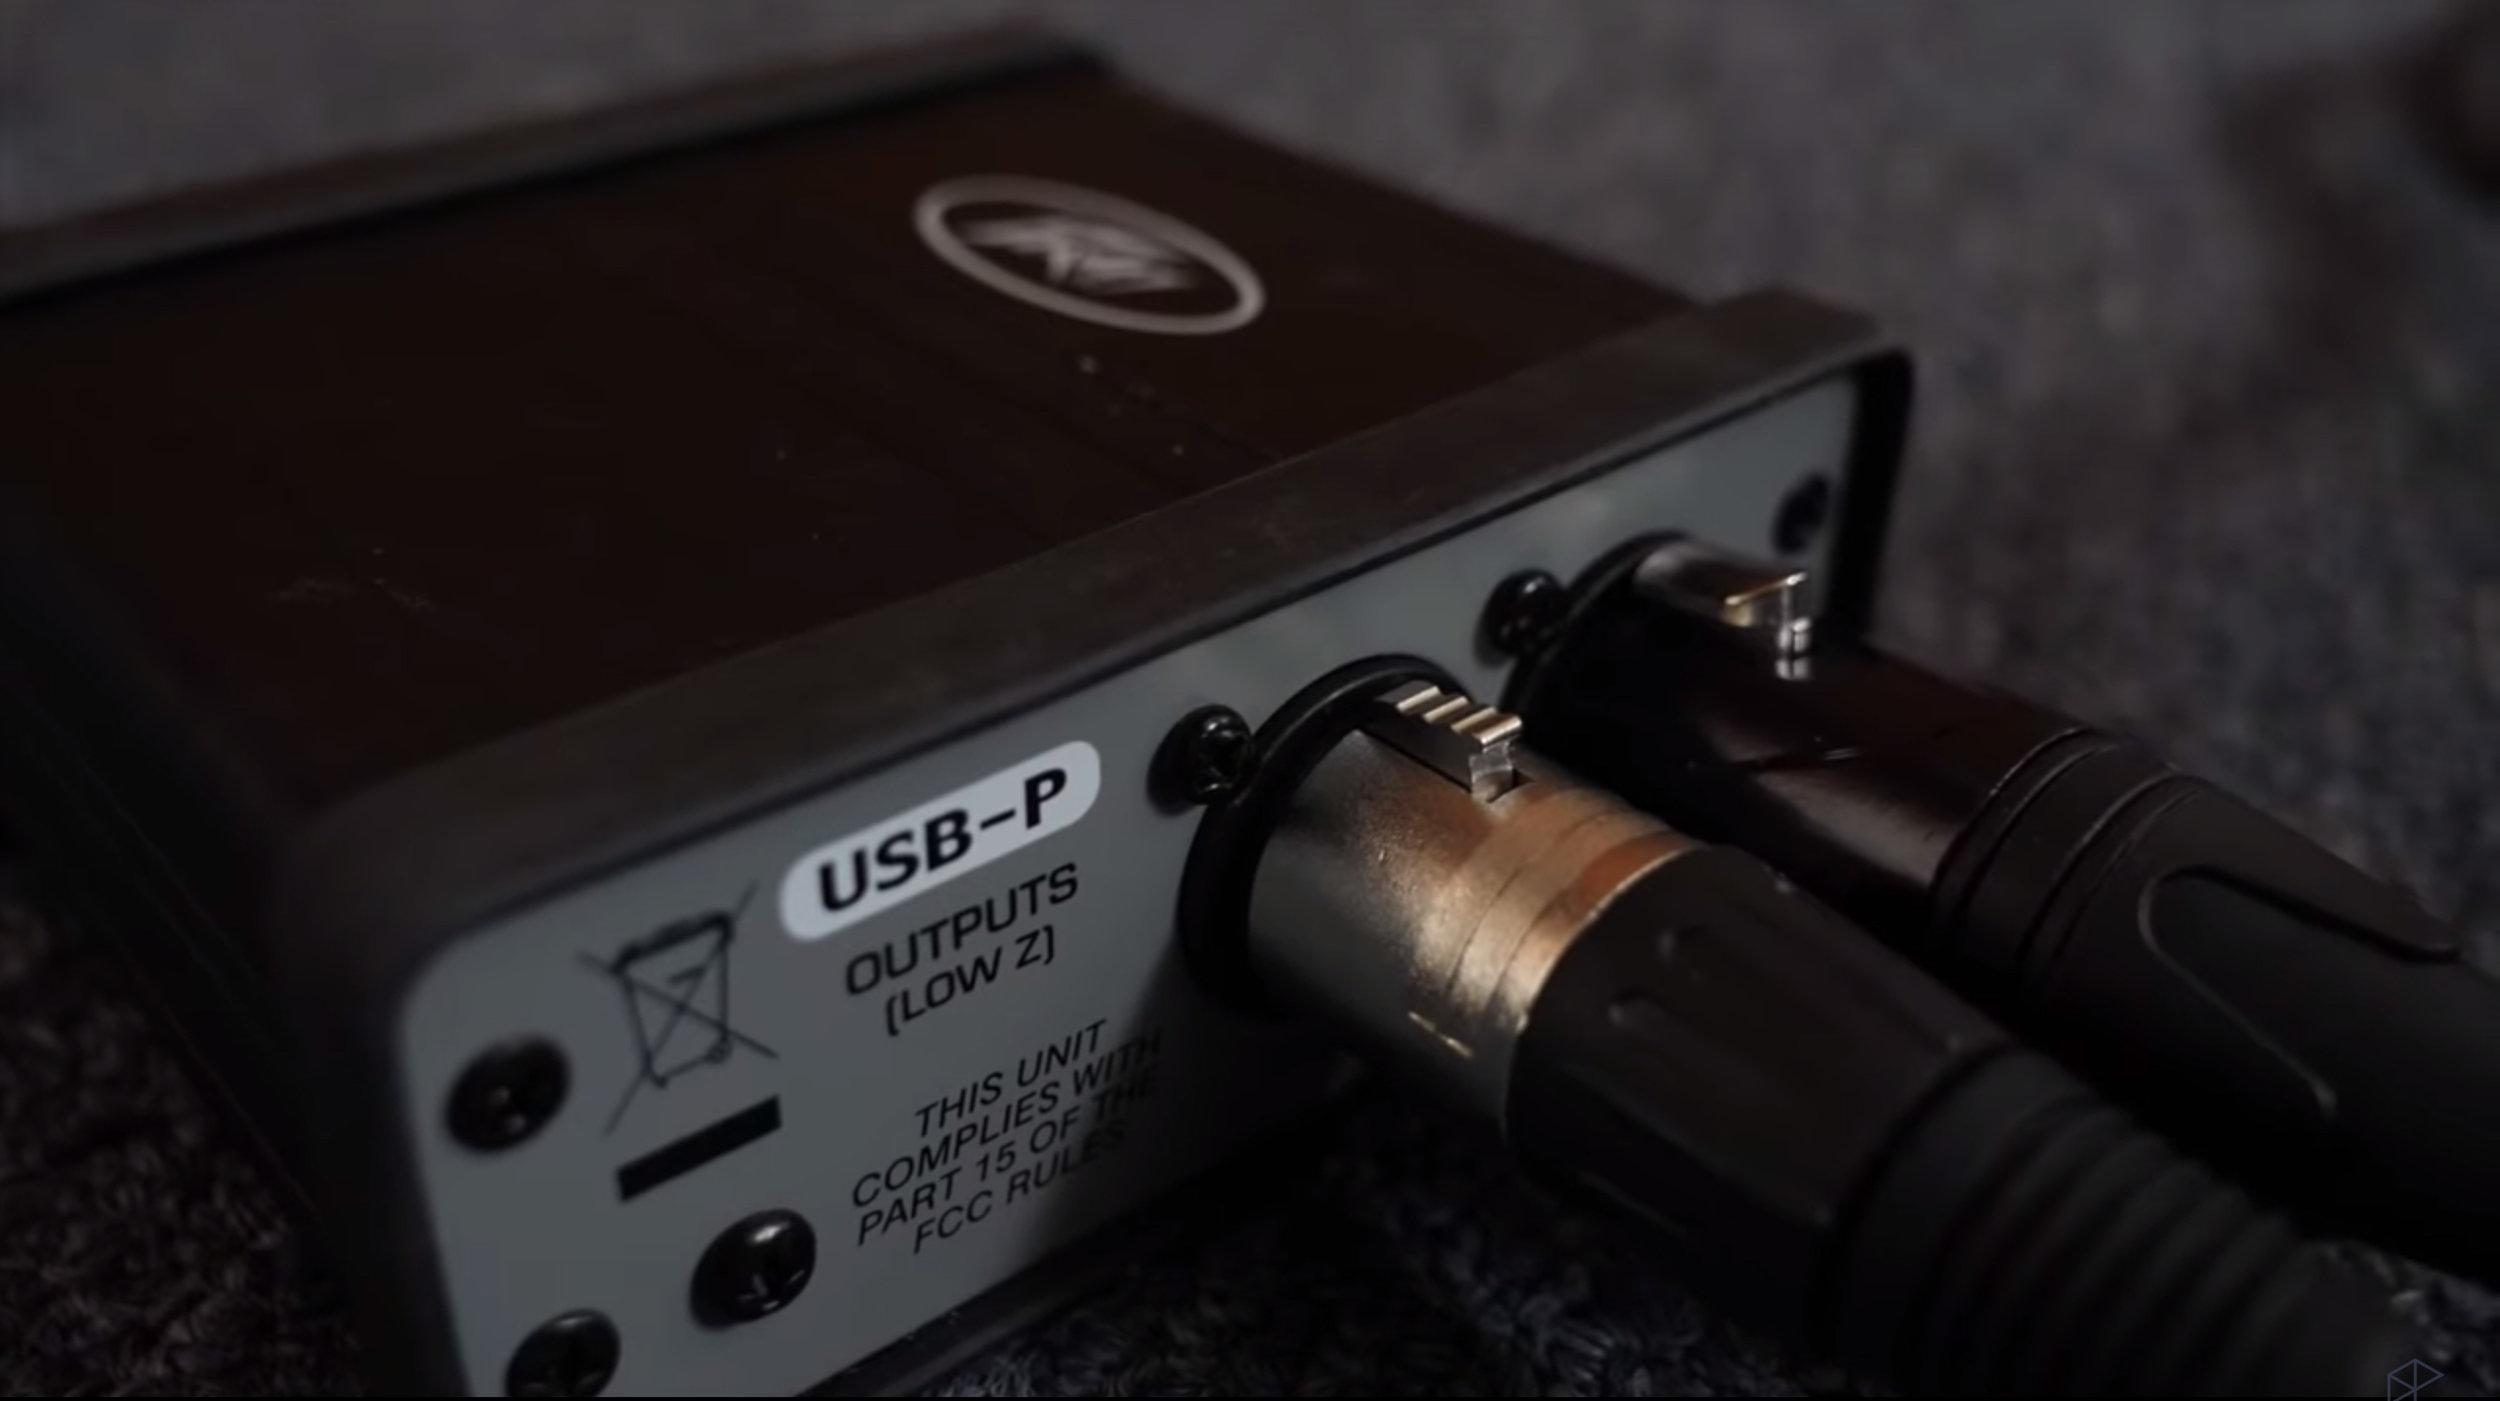 10. USB-P copy.jpg